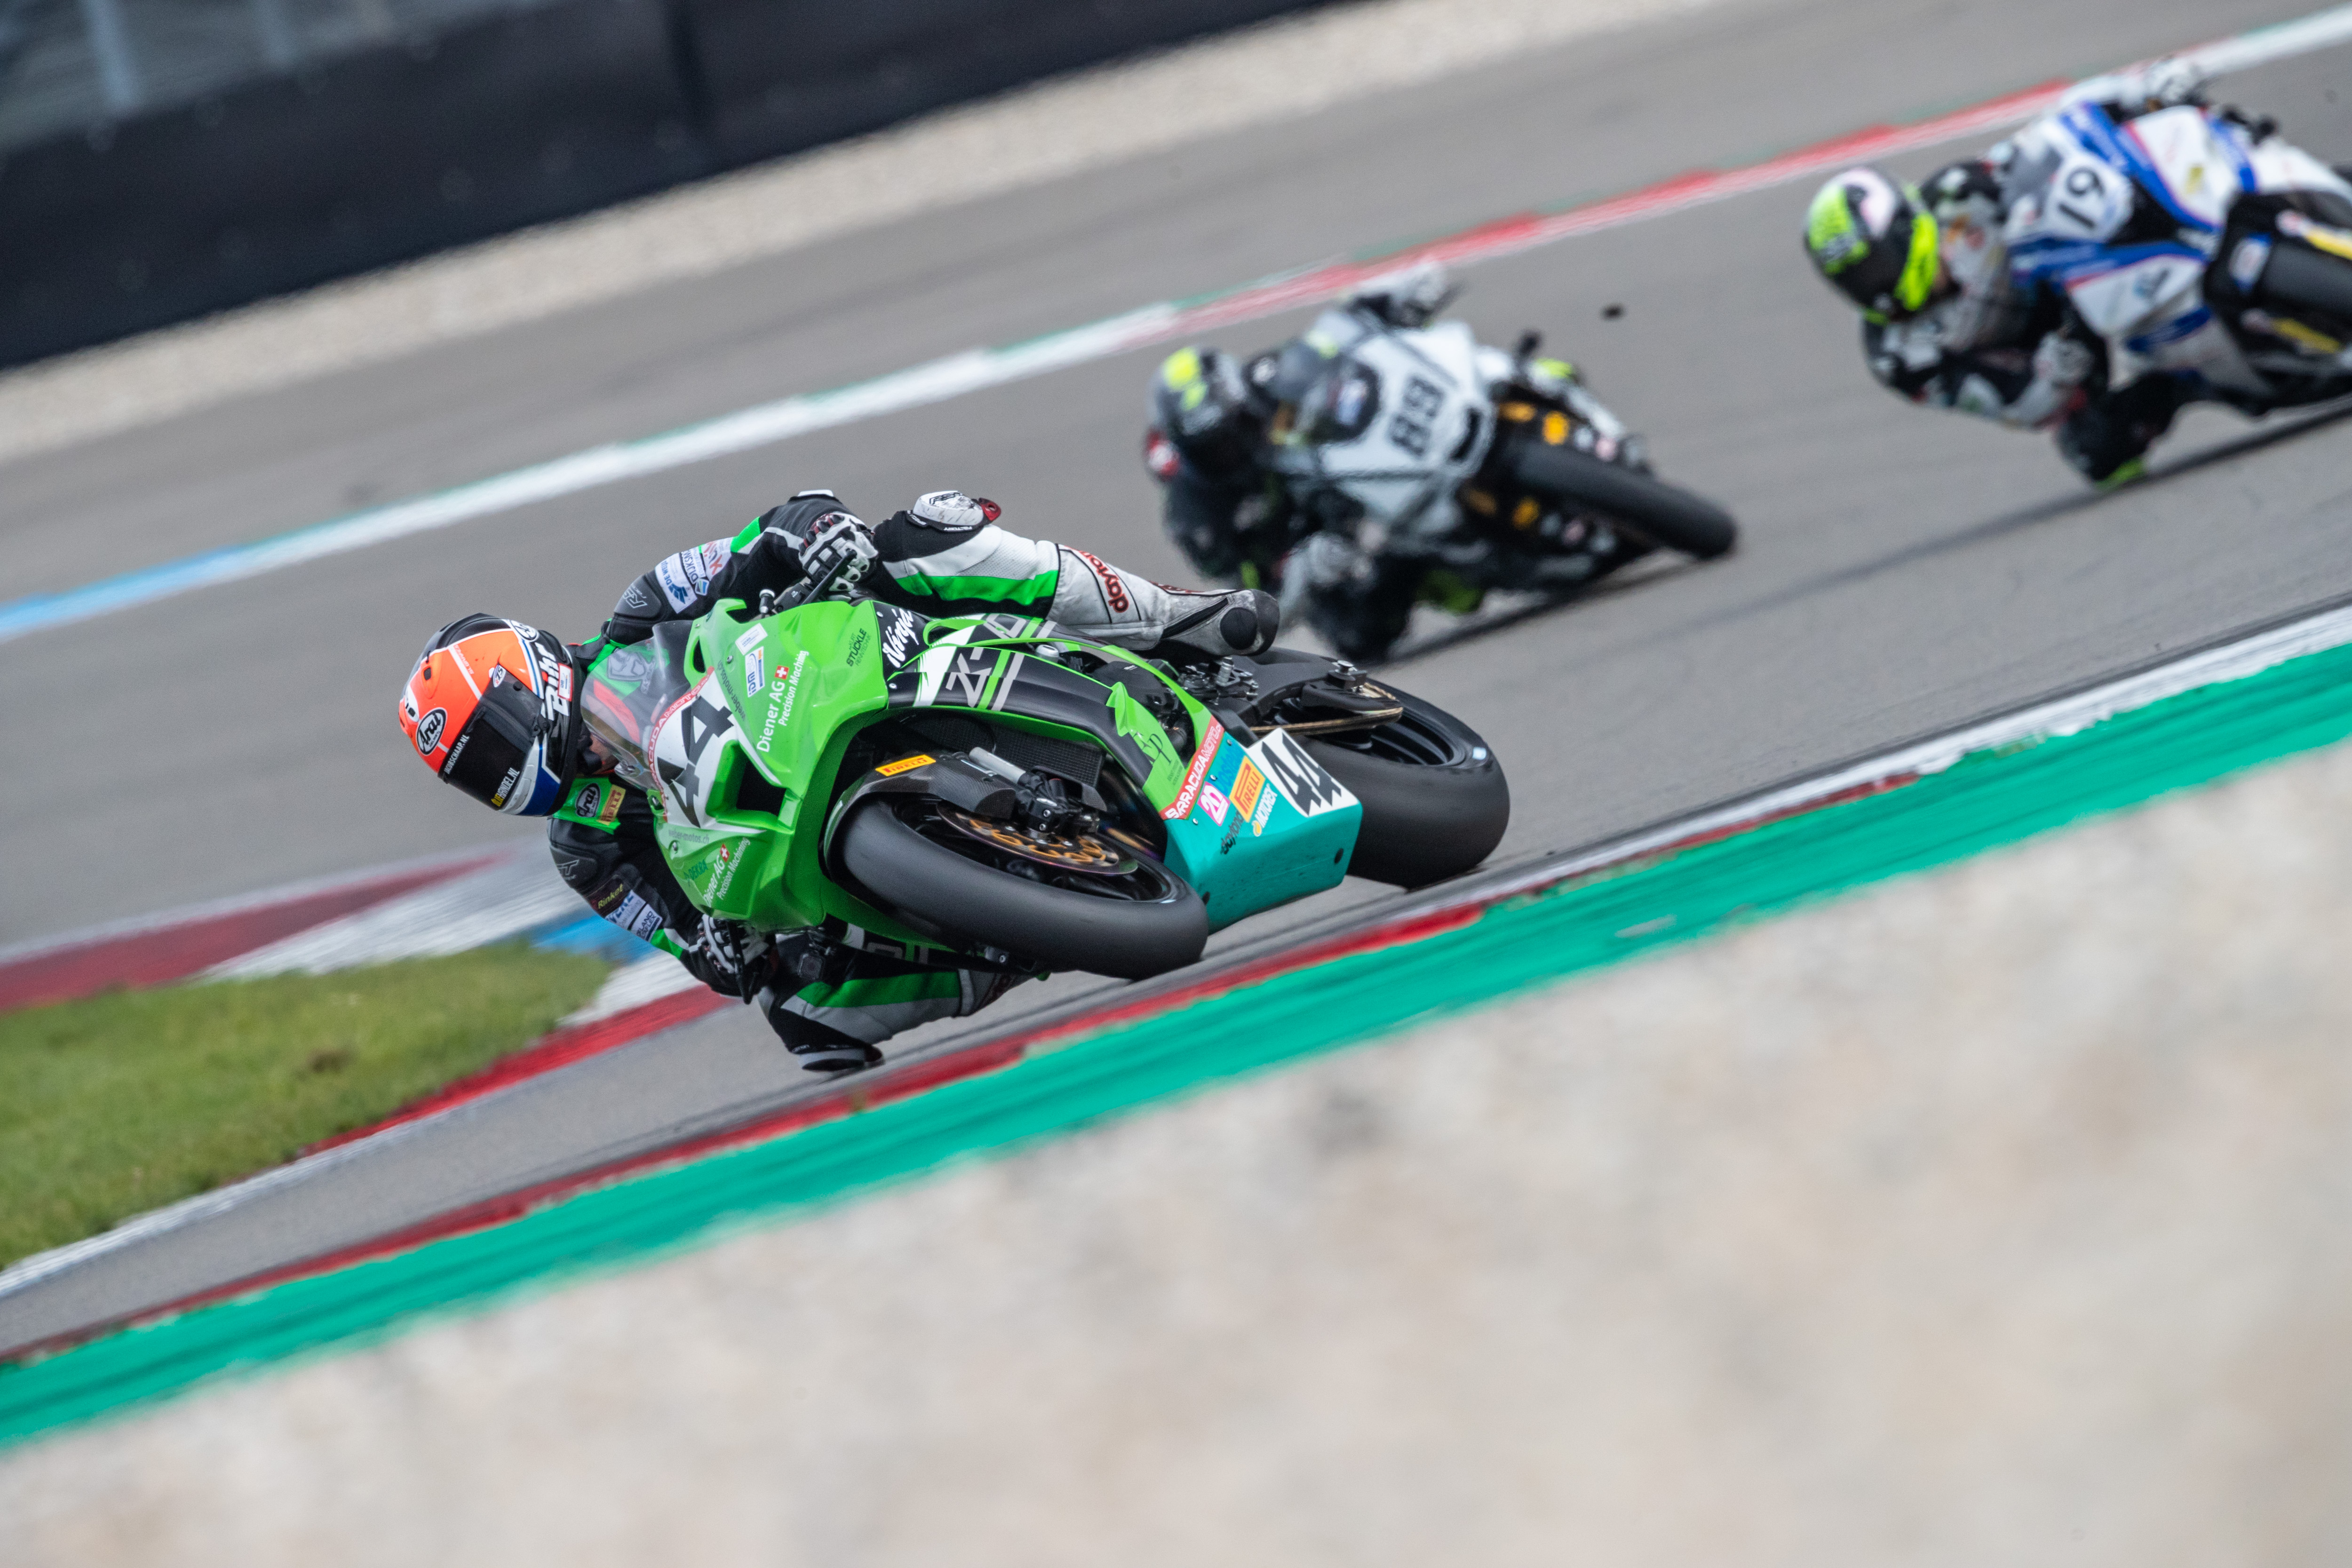 IDM Superbike 1000: Danny de Boer bleibt zu Hause, aber Kawasaki hat einen Plan B